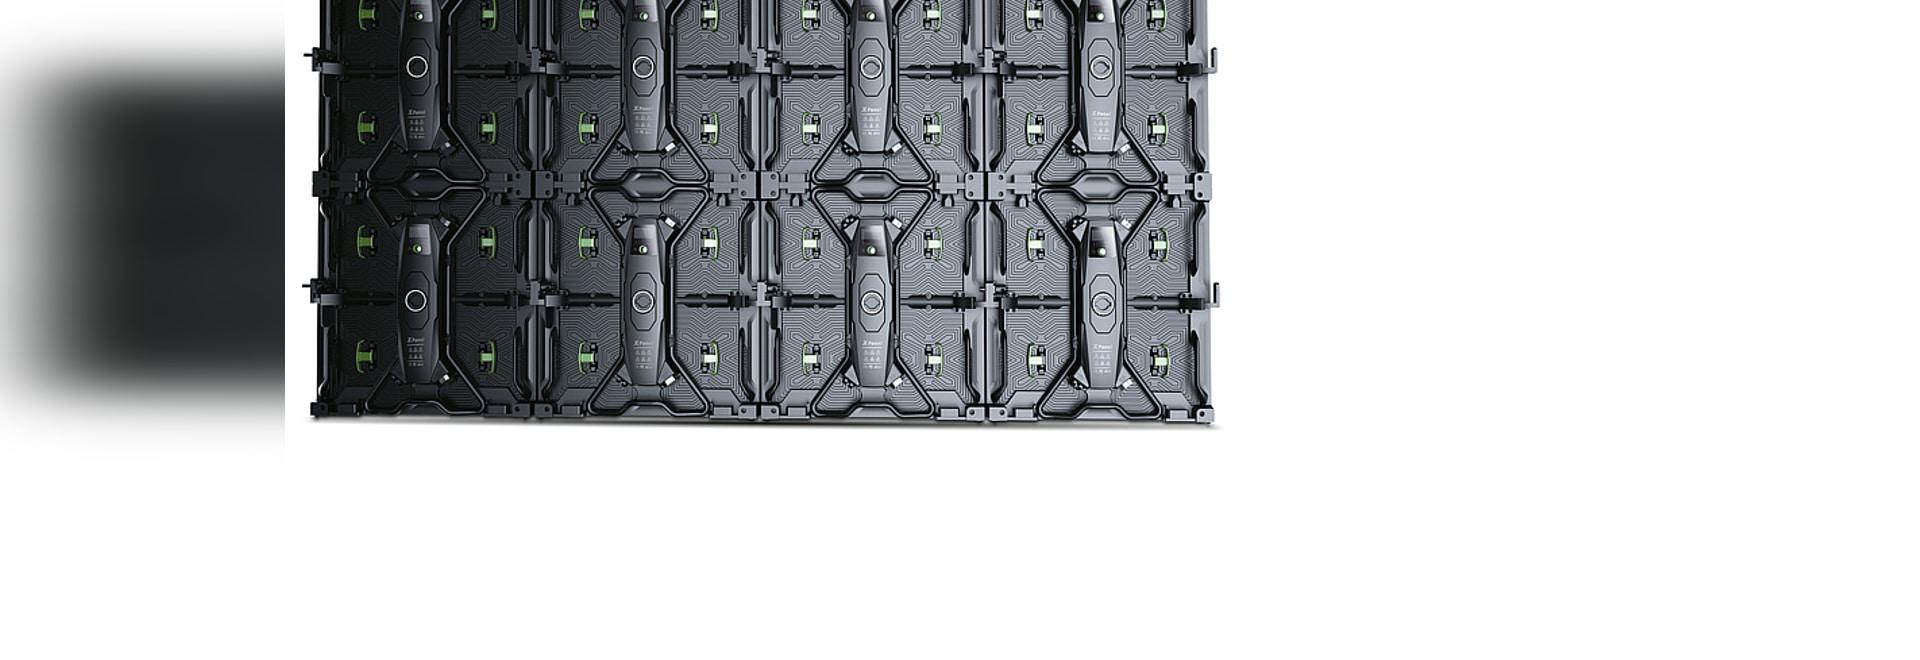 Multifunction LED Display